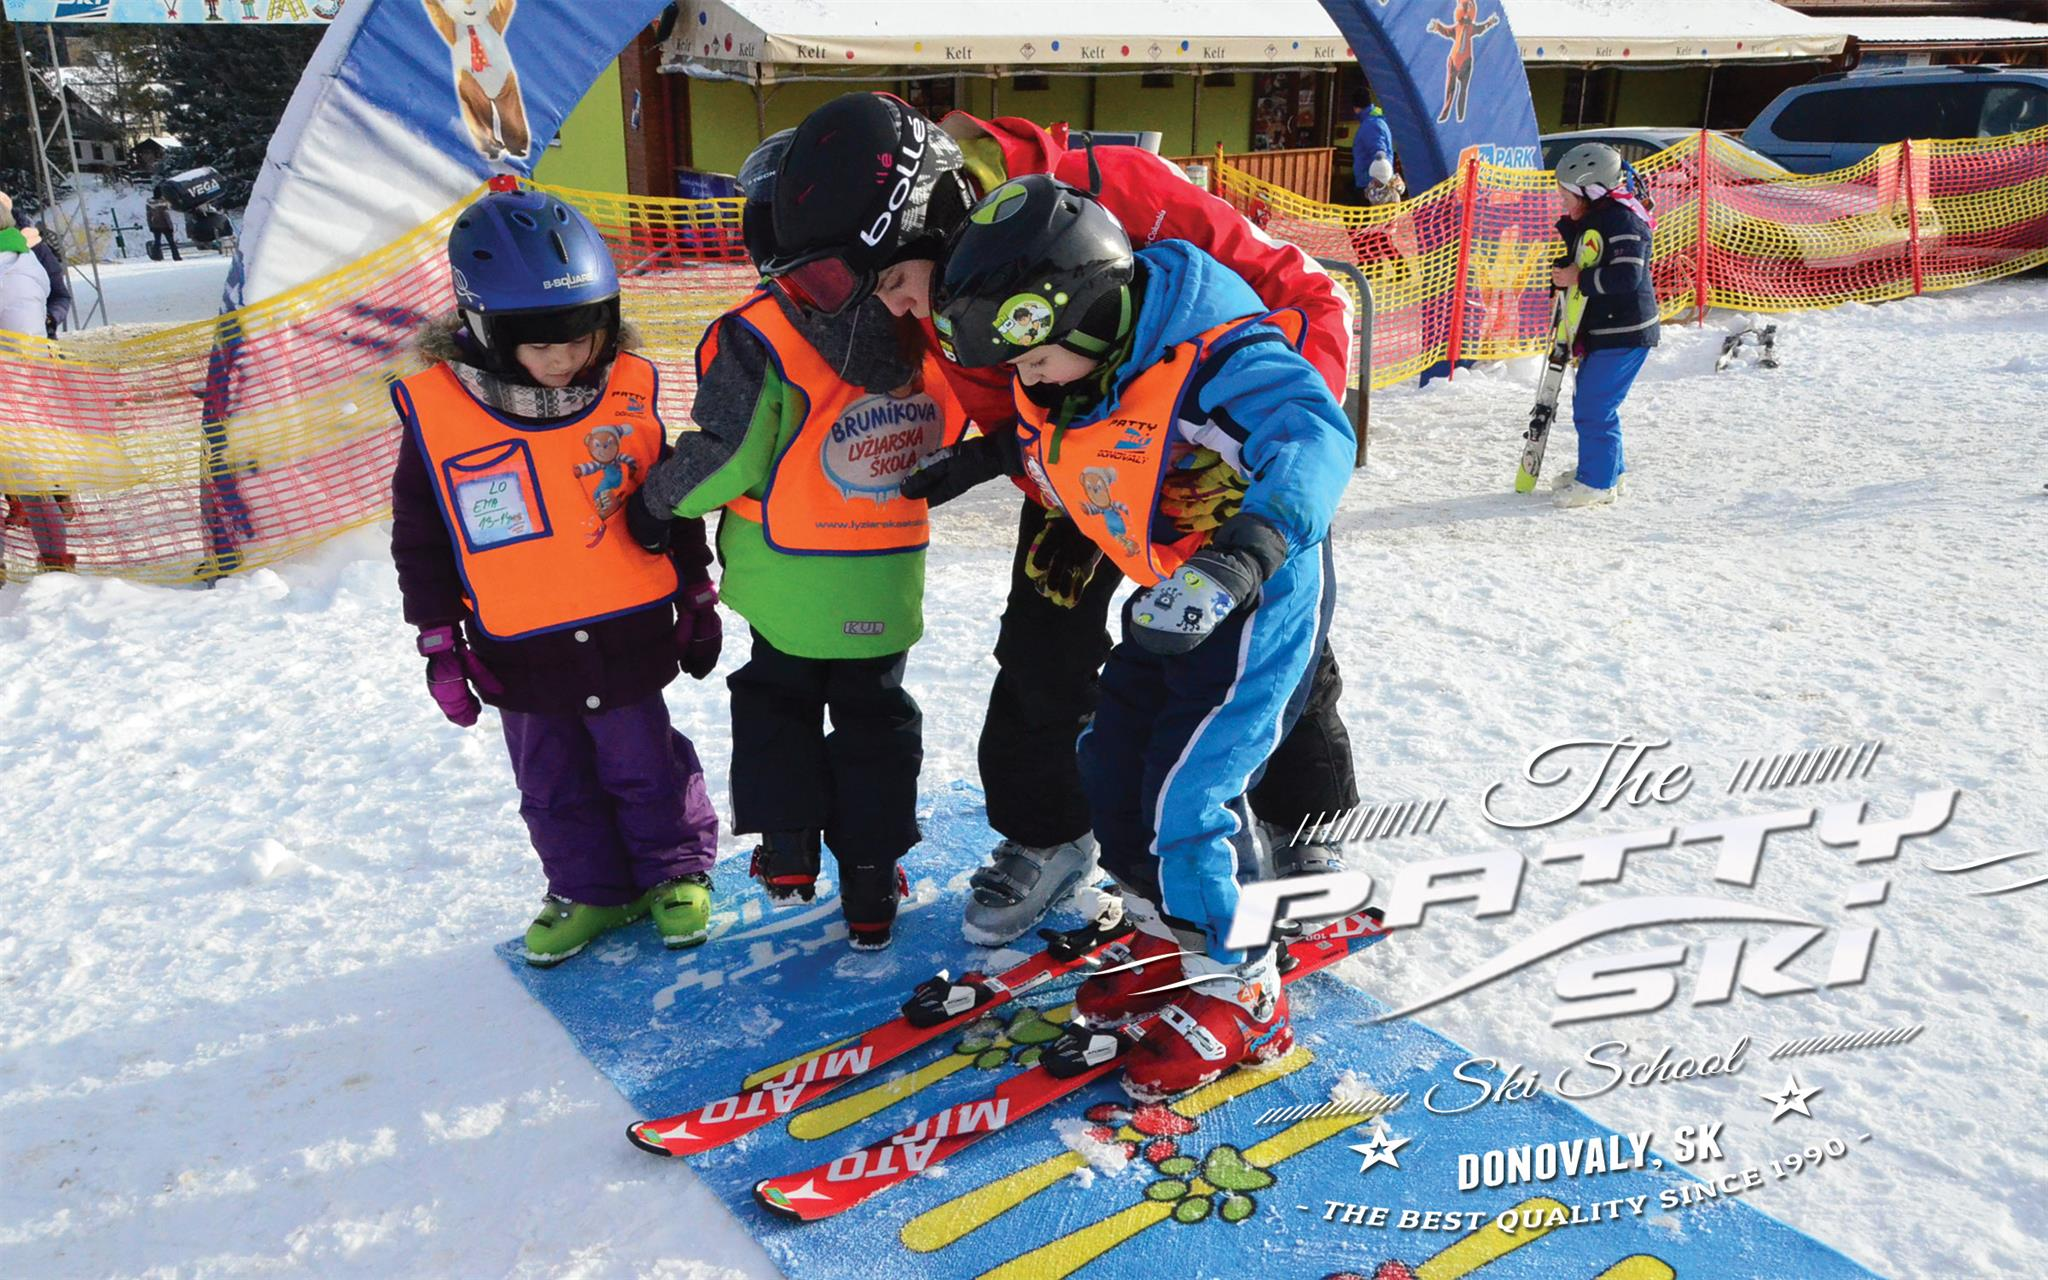 Retro-skicourse-schoolweb